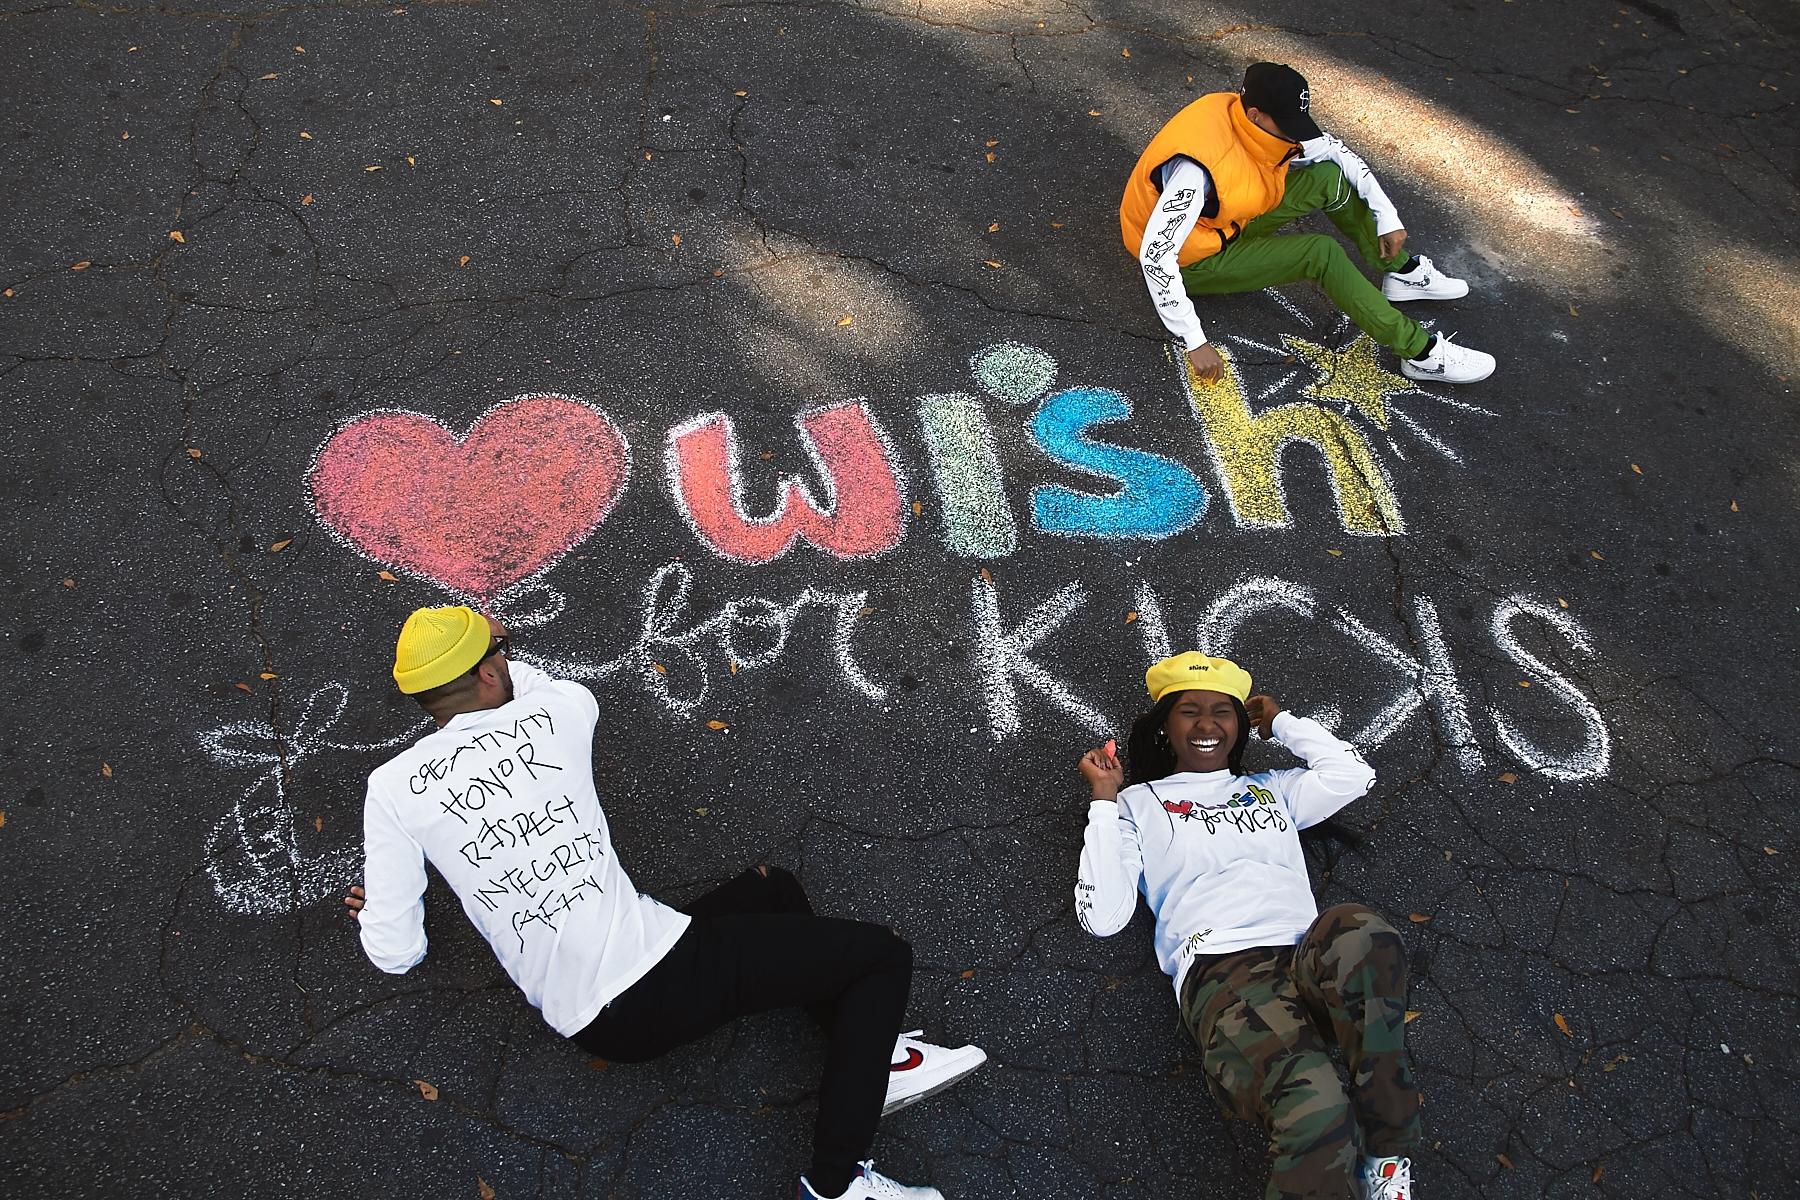 WISH FOR KICKS 'GIVING BACK' TEE #WishForKicks